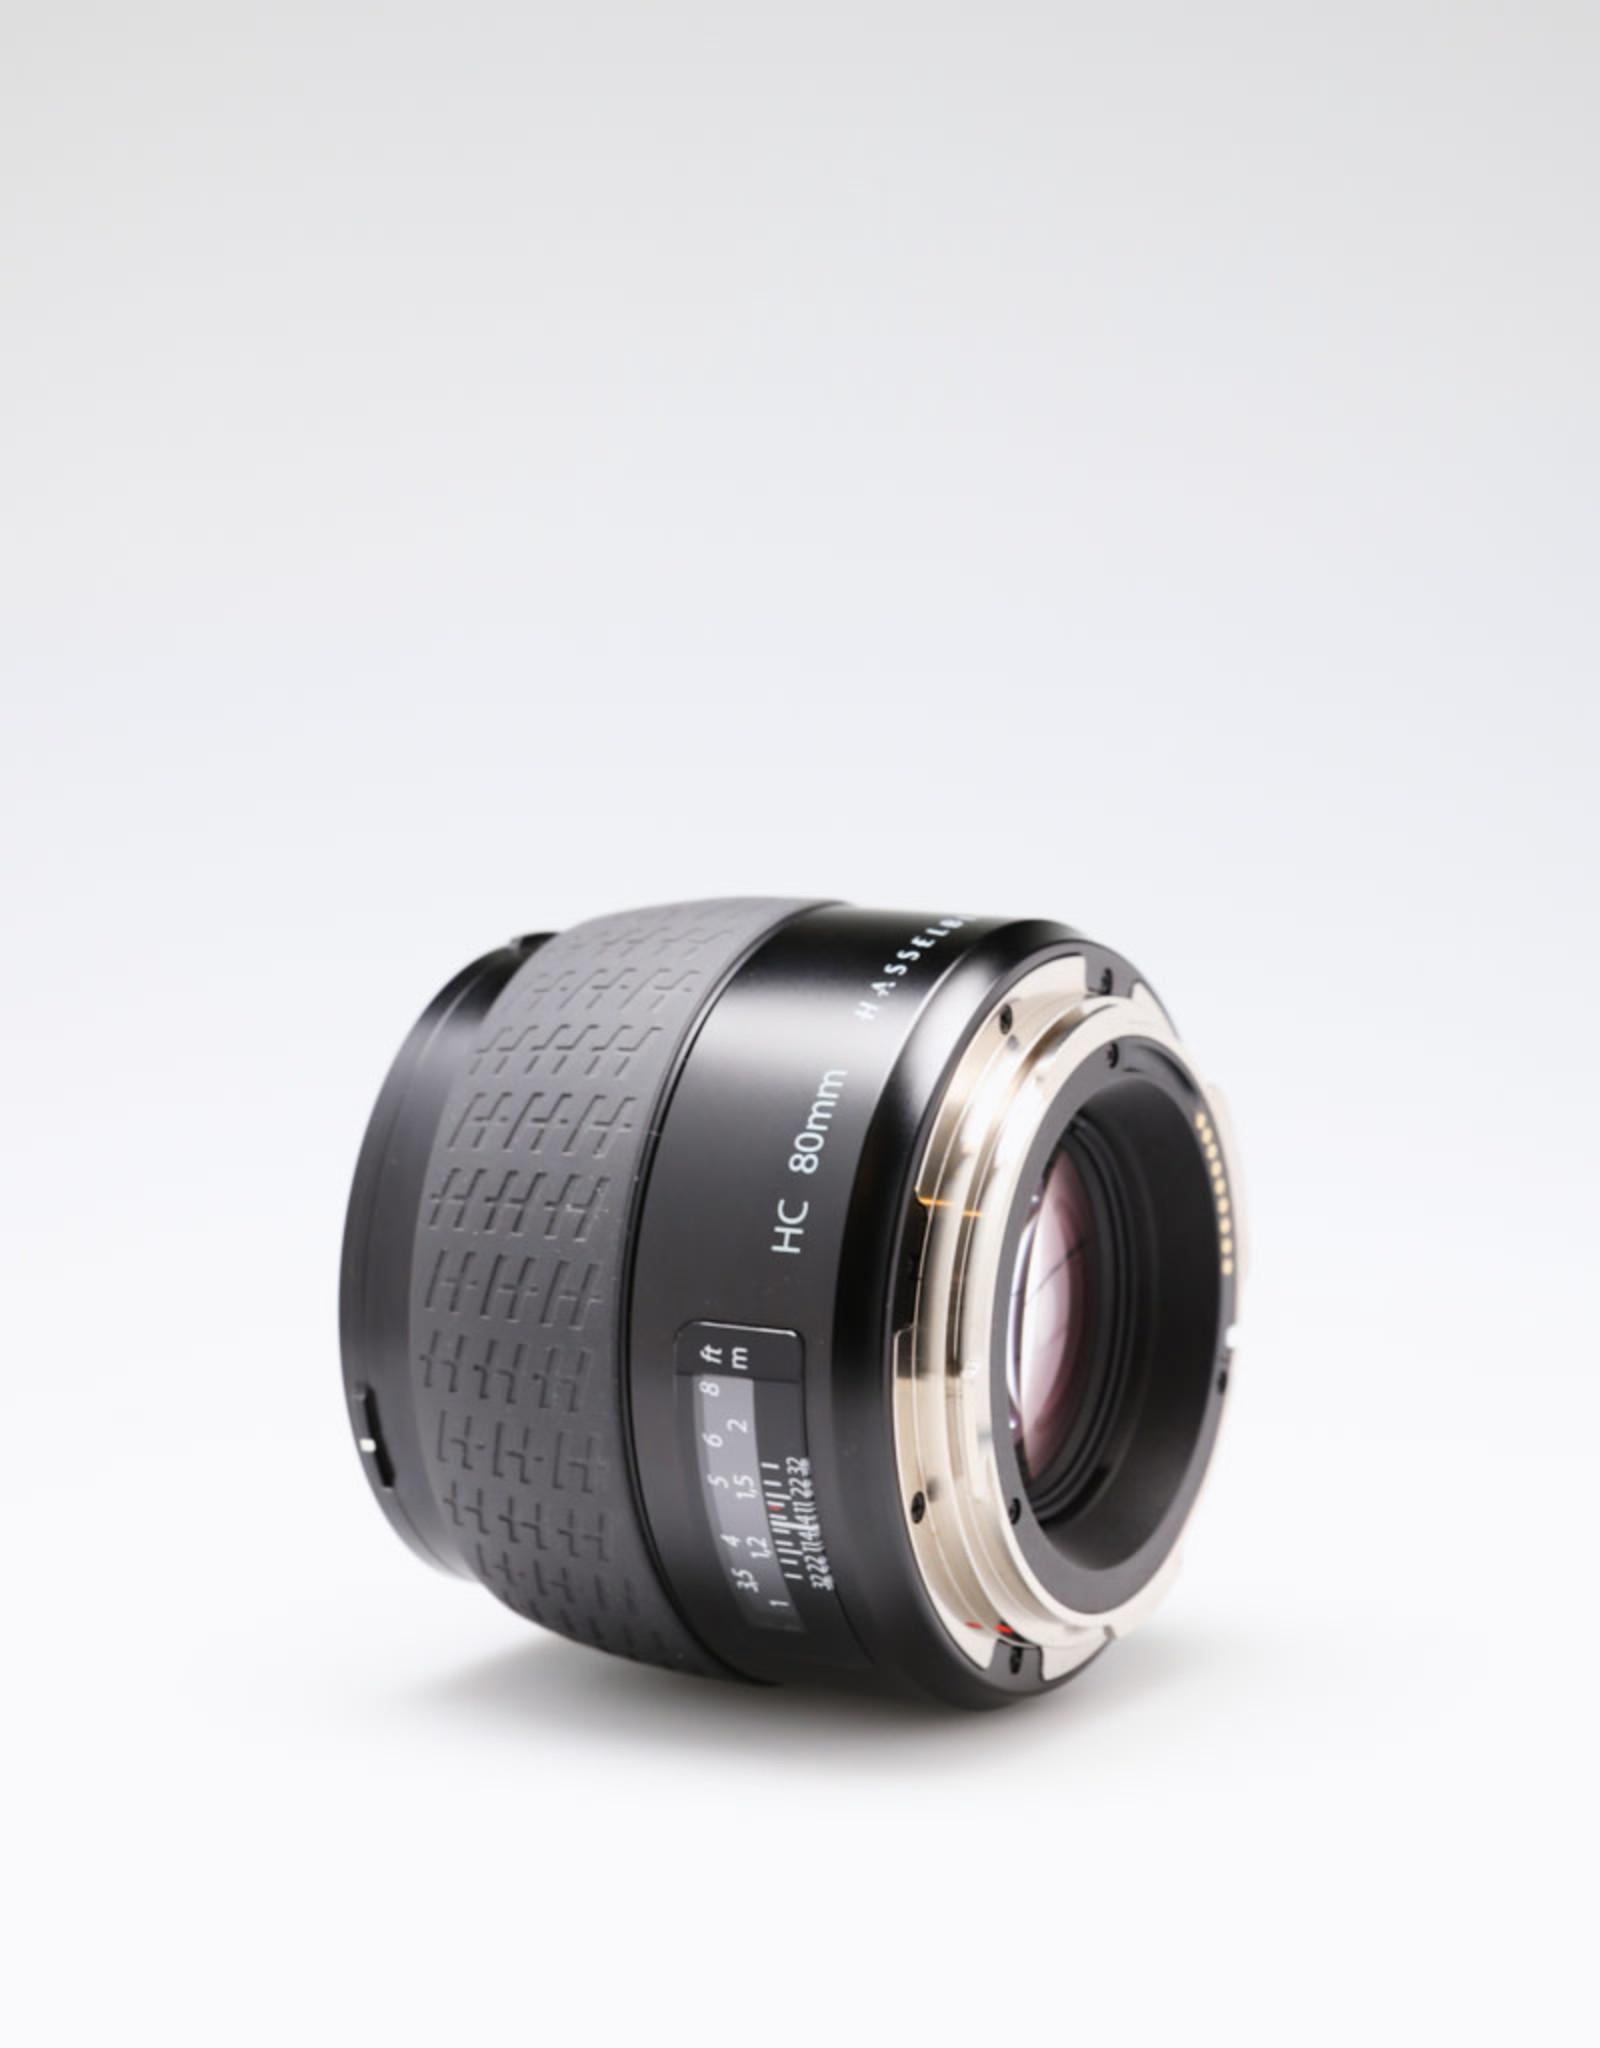 USED  Hasselblad HC 80mm F2.8 Lens